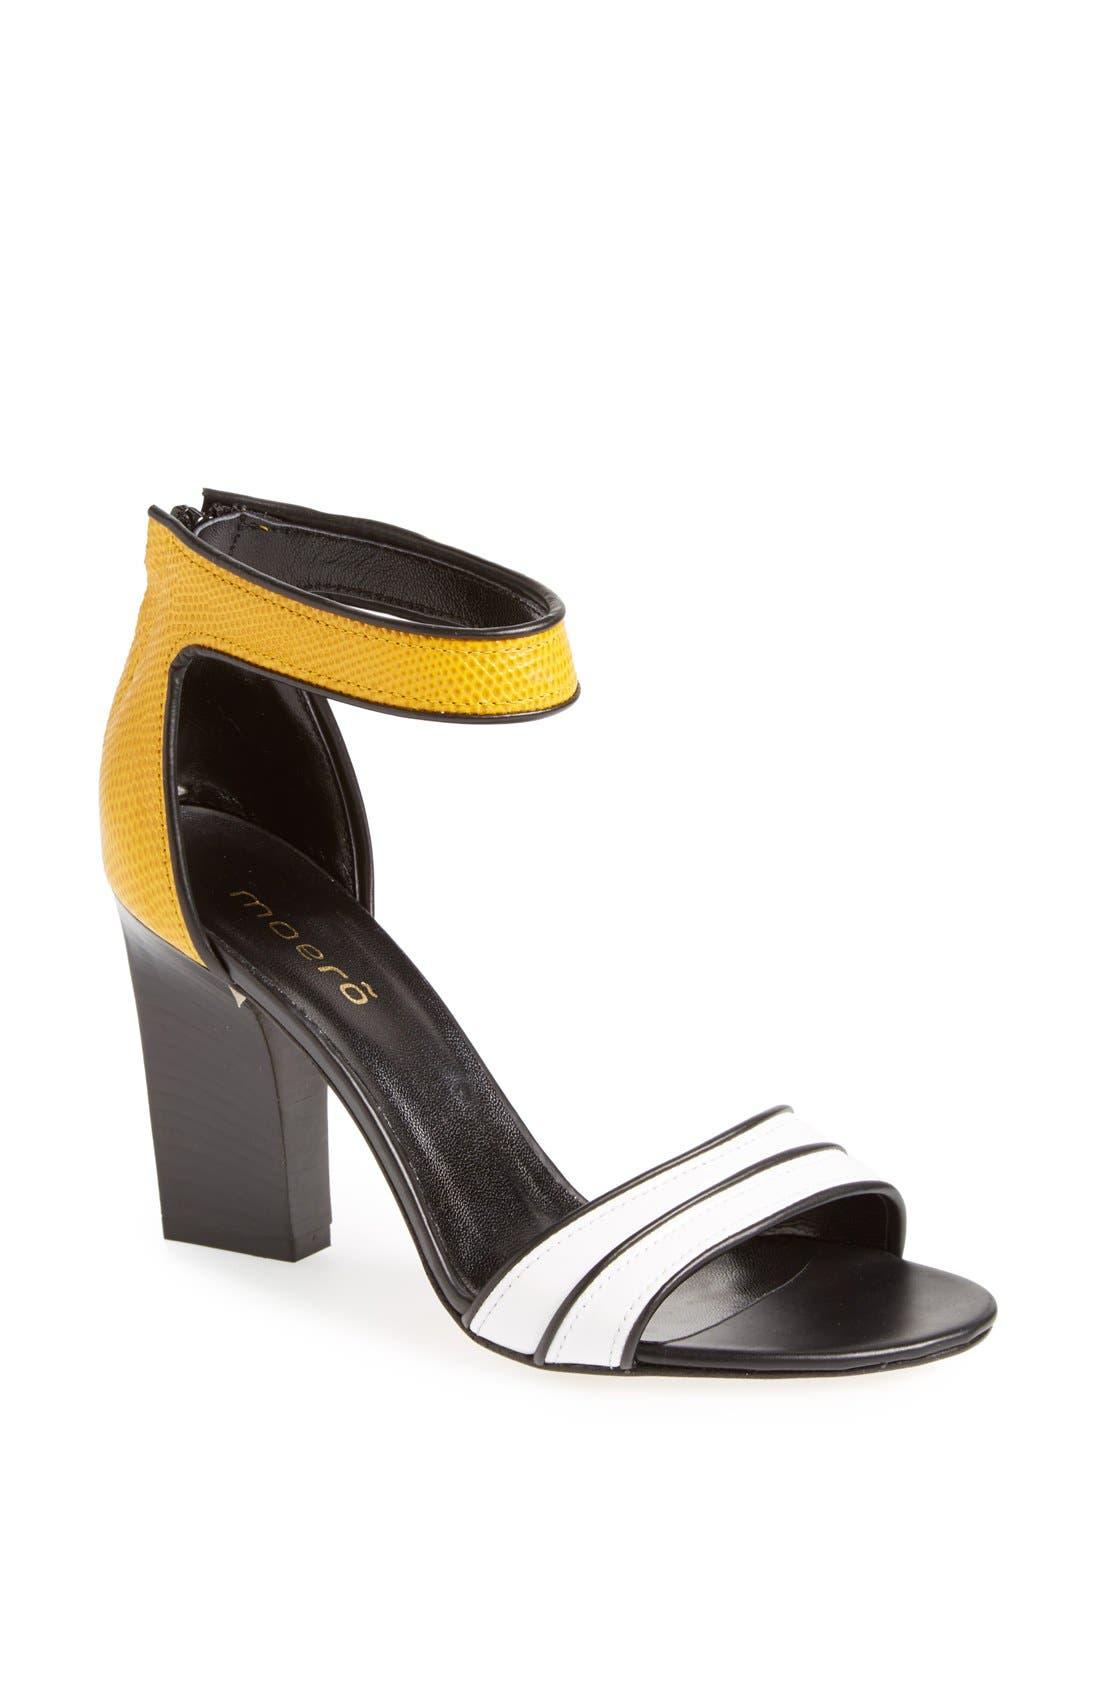 Main Image - Moero Snake Embossed Leather Sandal